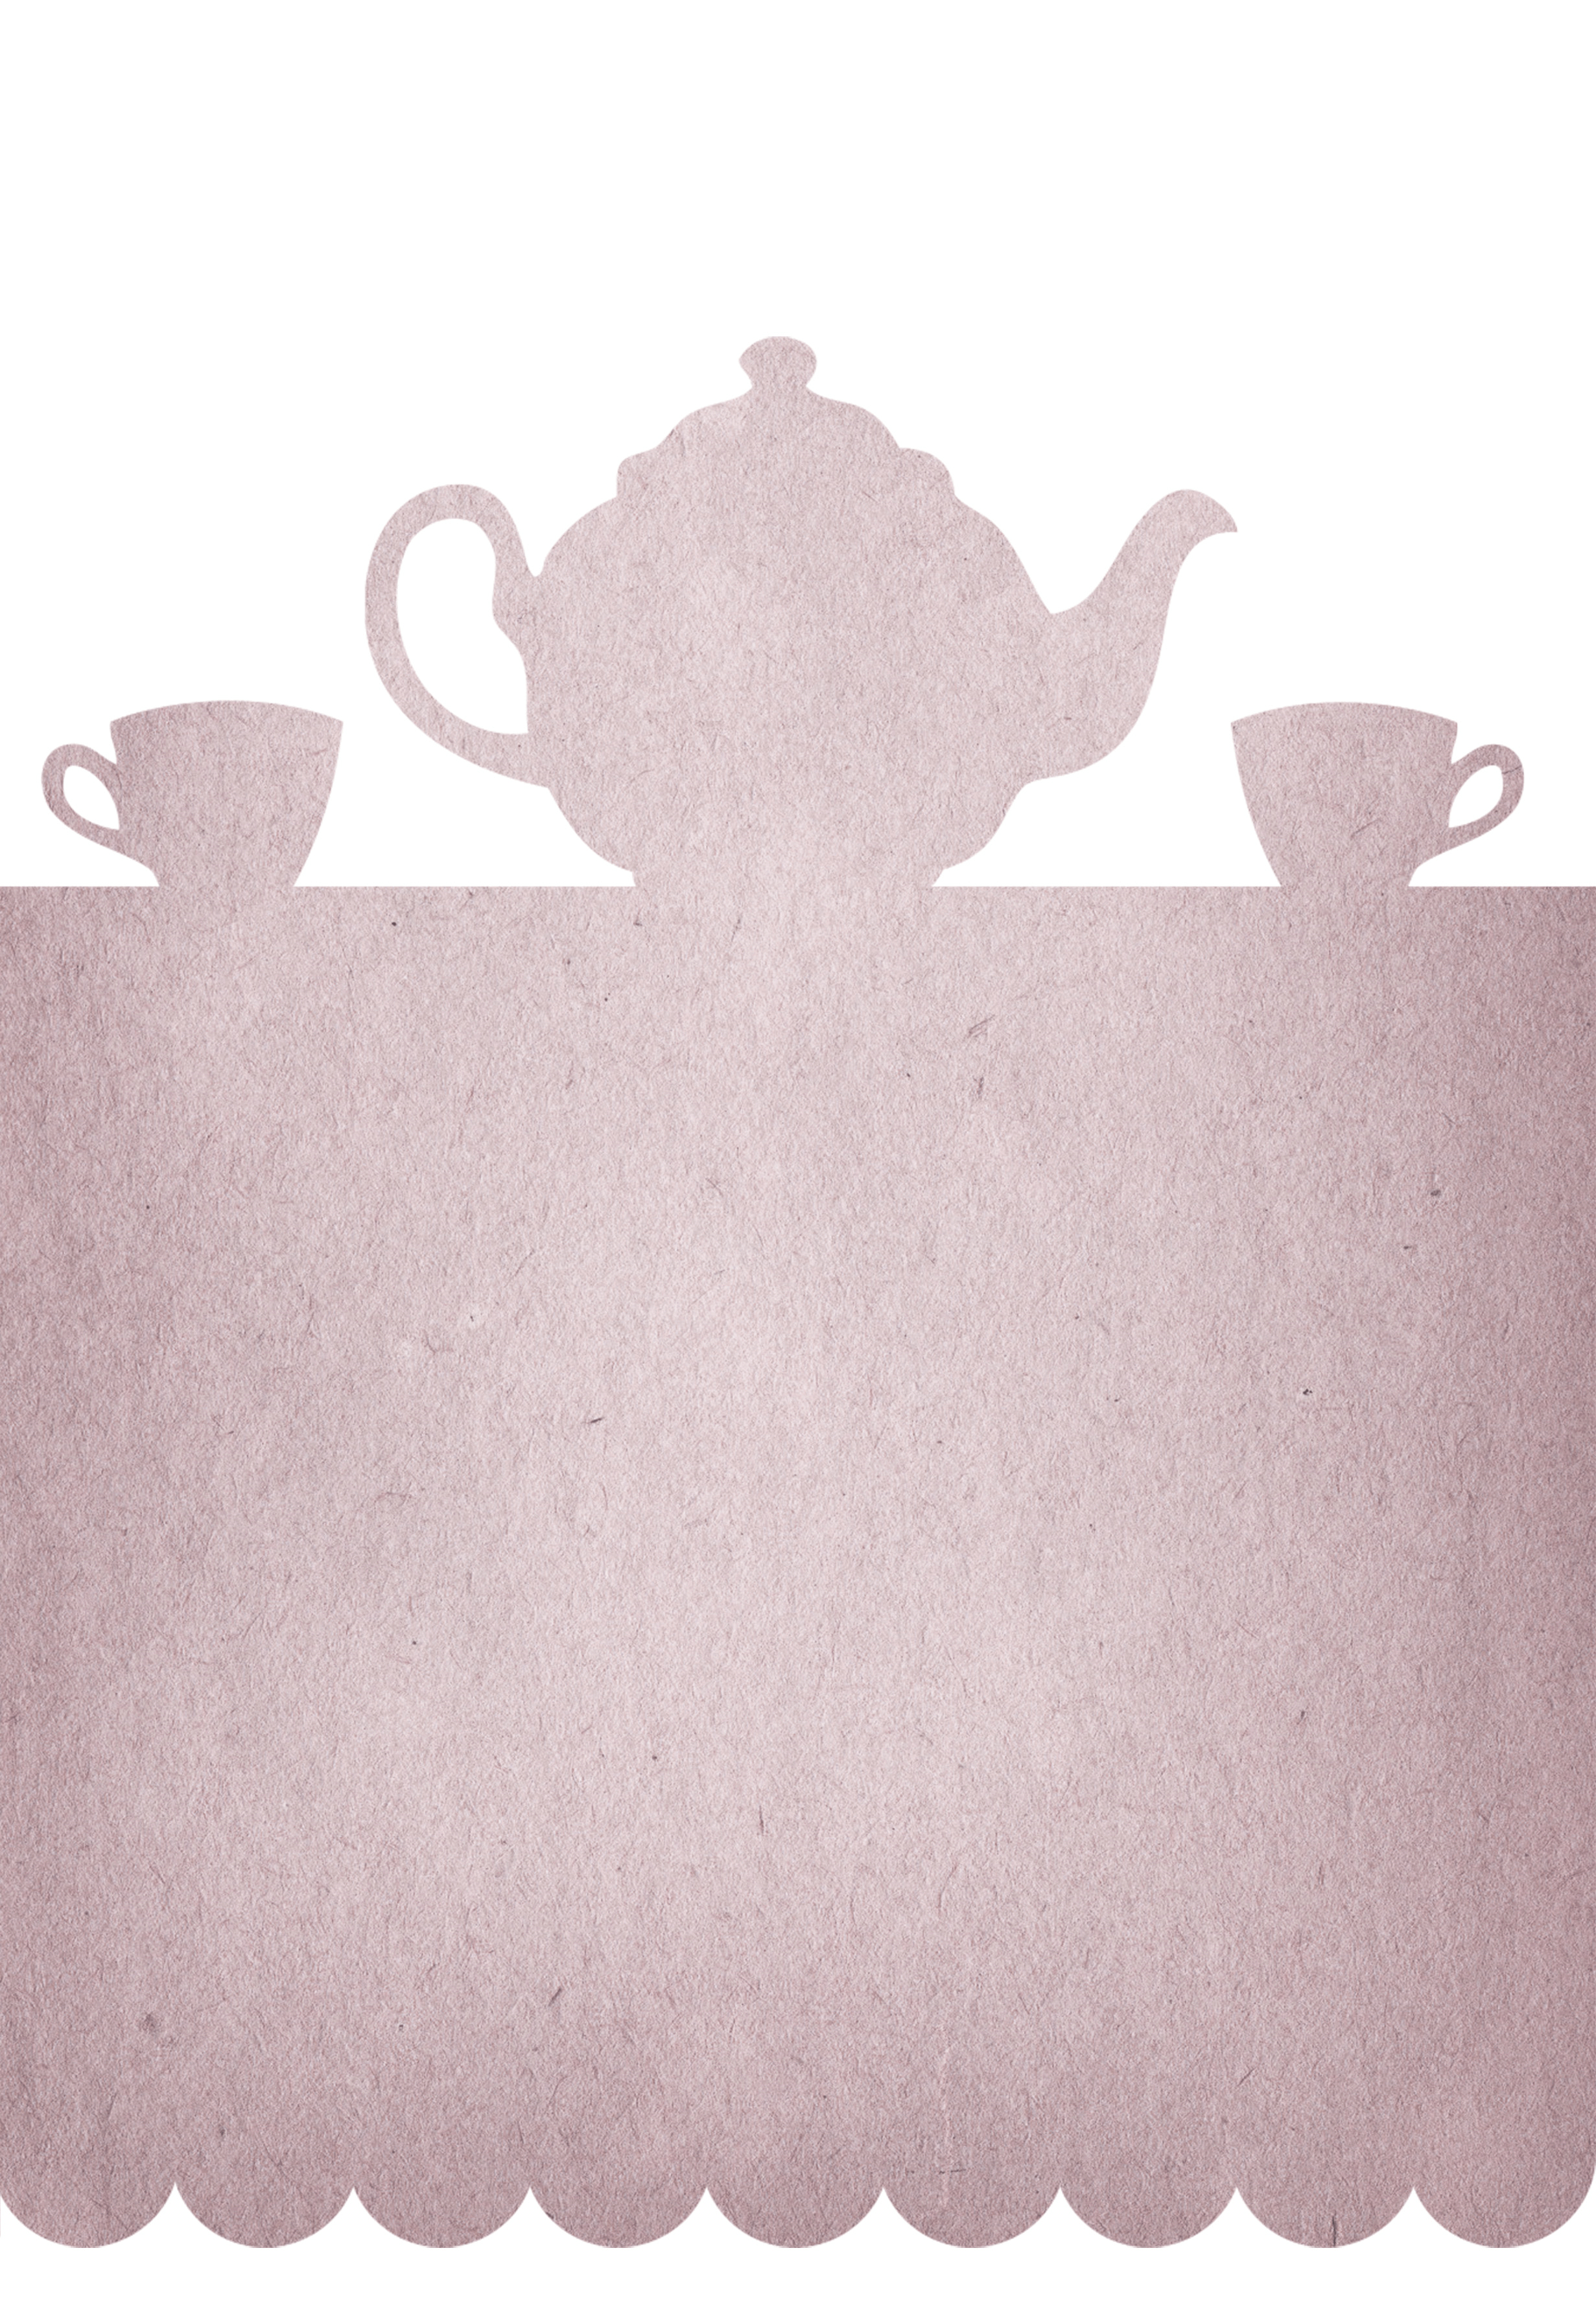 Tea Party - Free Printable Party Invitation Template   Greetings - Free Printable Kitchen Tea Invitation Templates